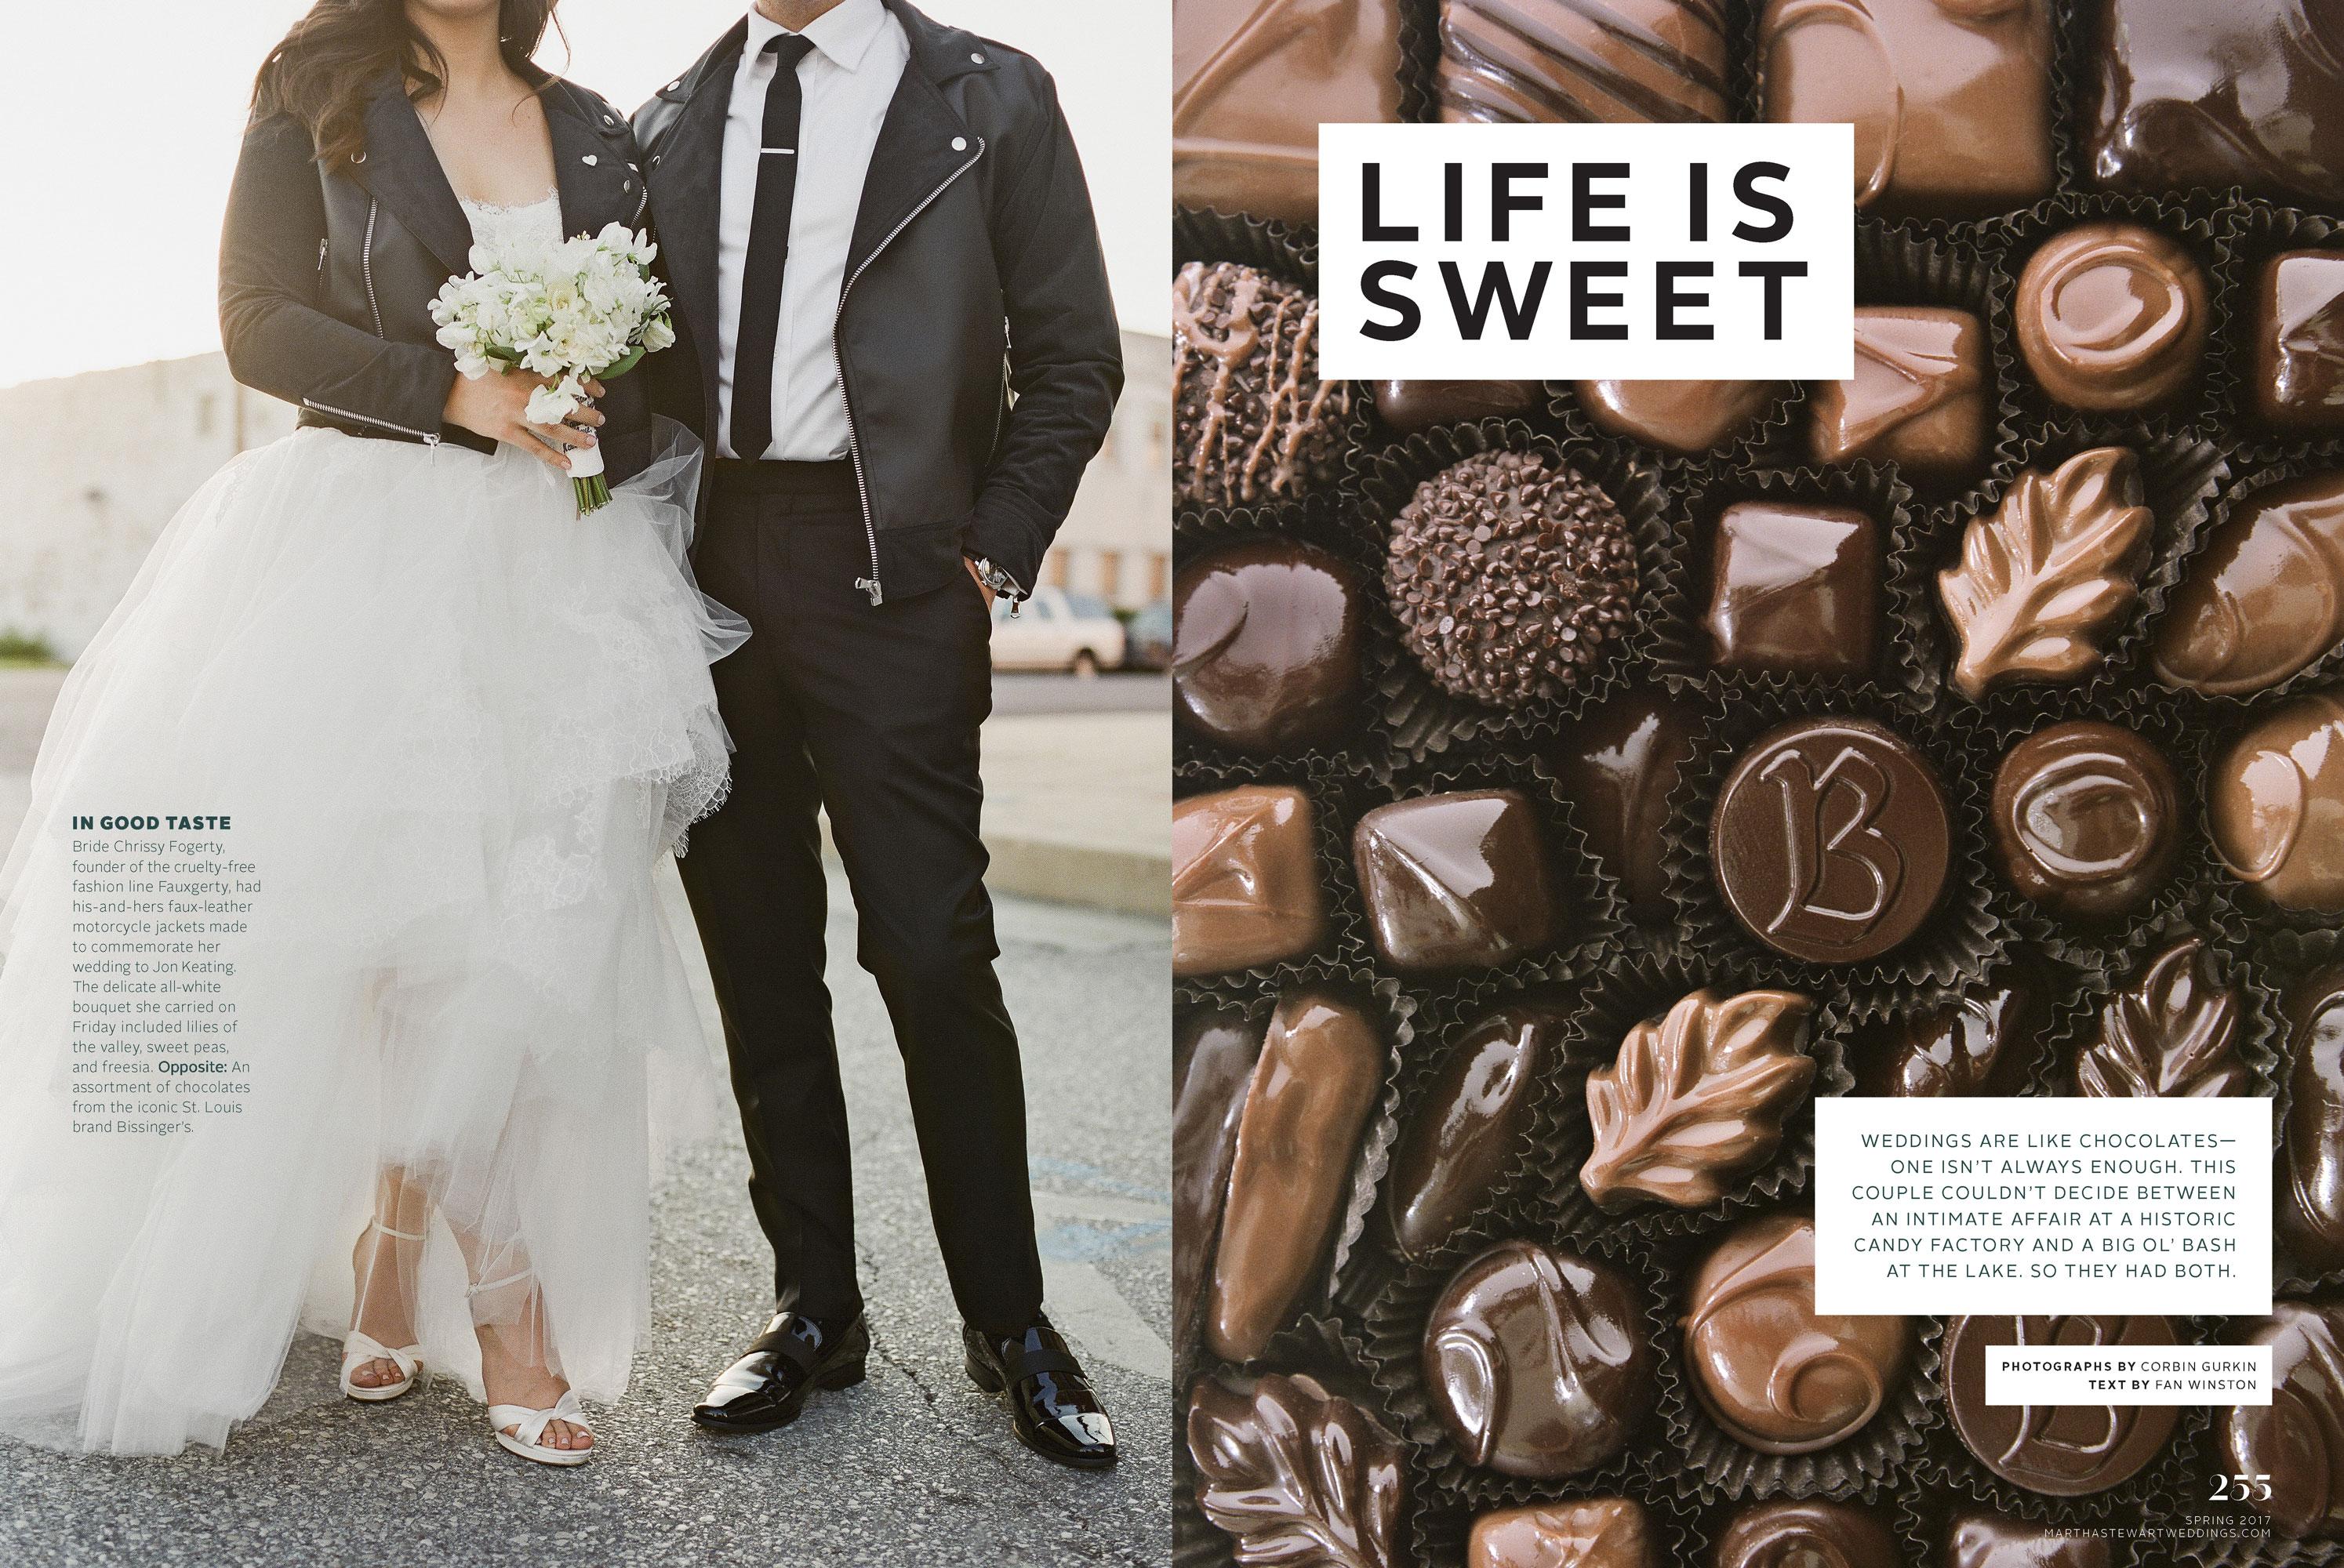 Life is Sweet by Megan Hillman